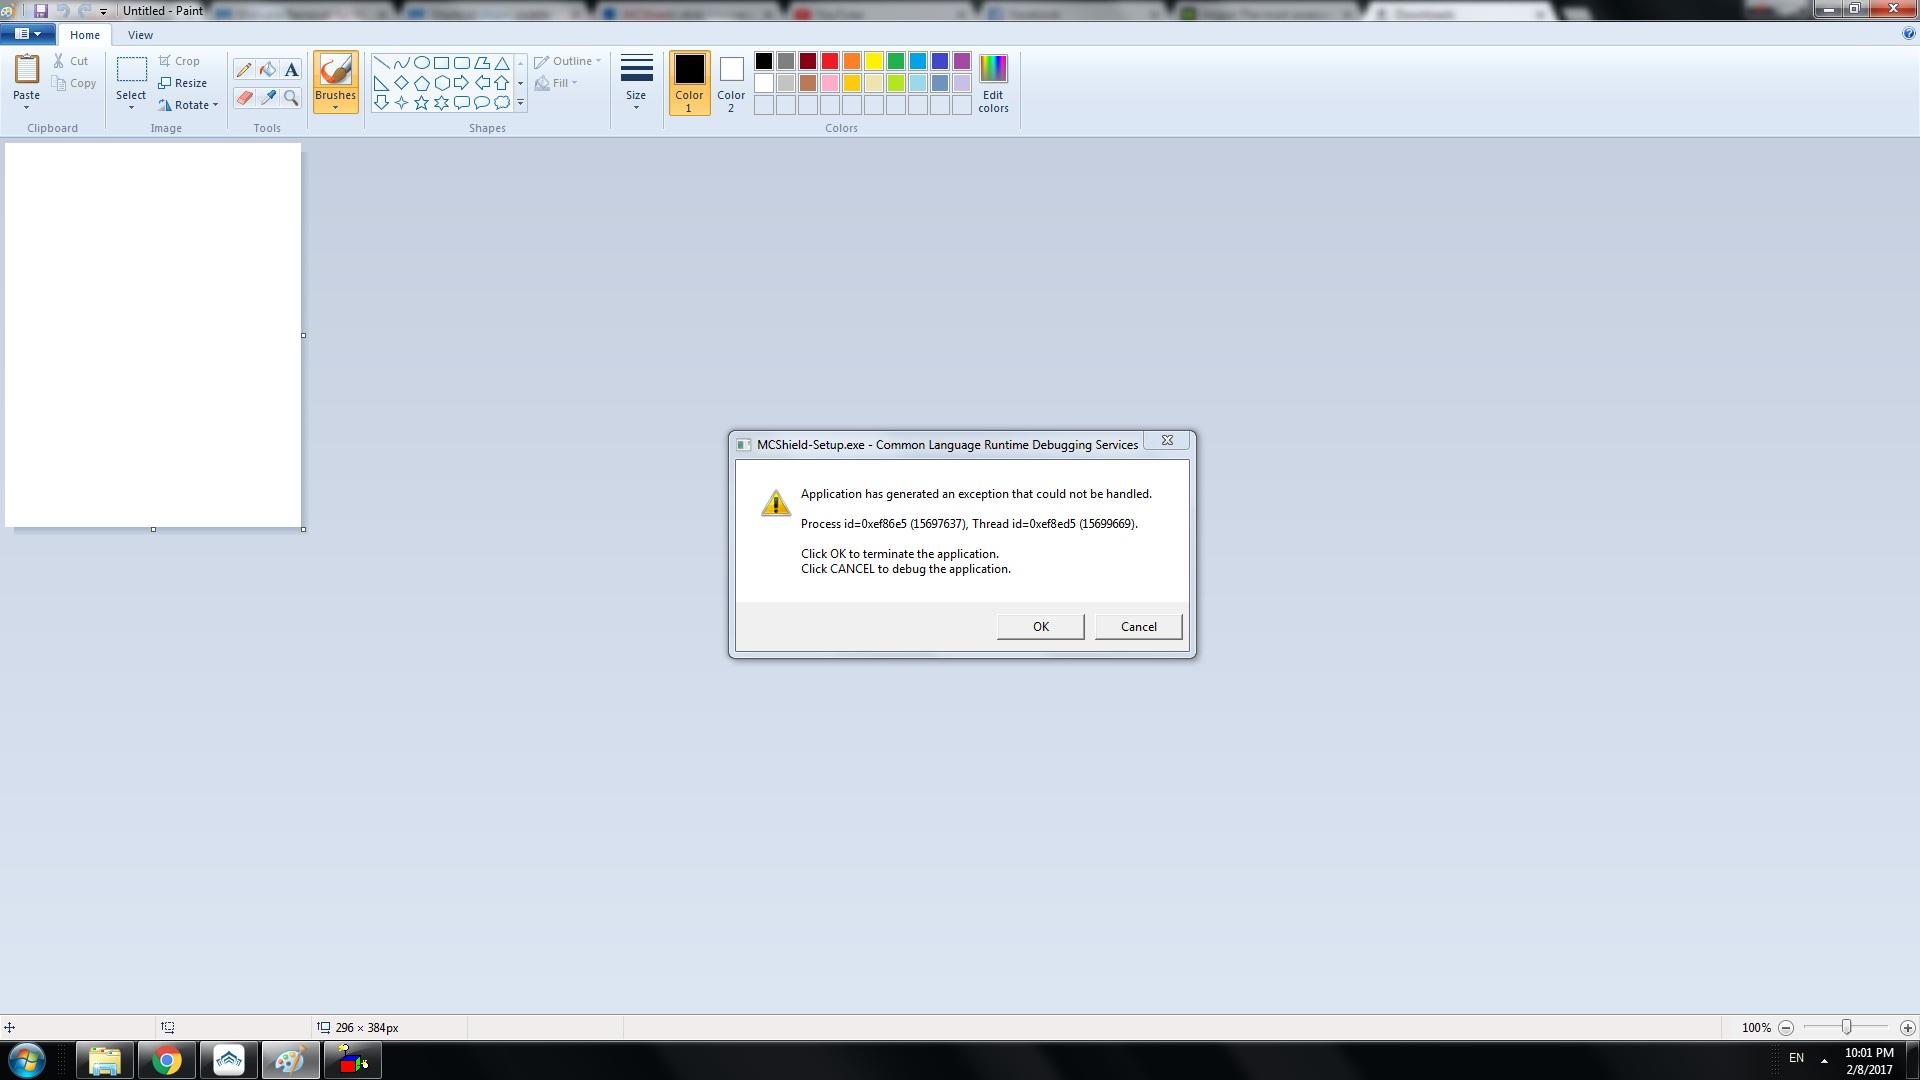 Shortcut virus+ unable to run malwarebytes or anyother antimalware